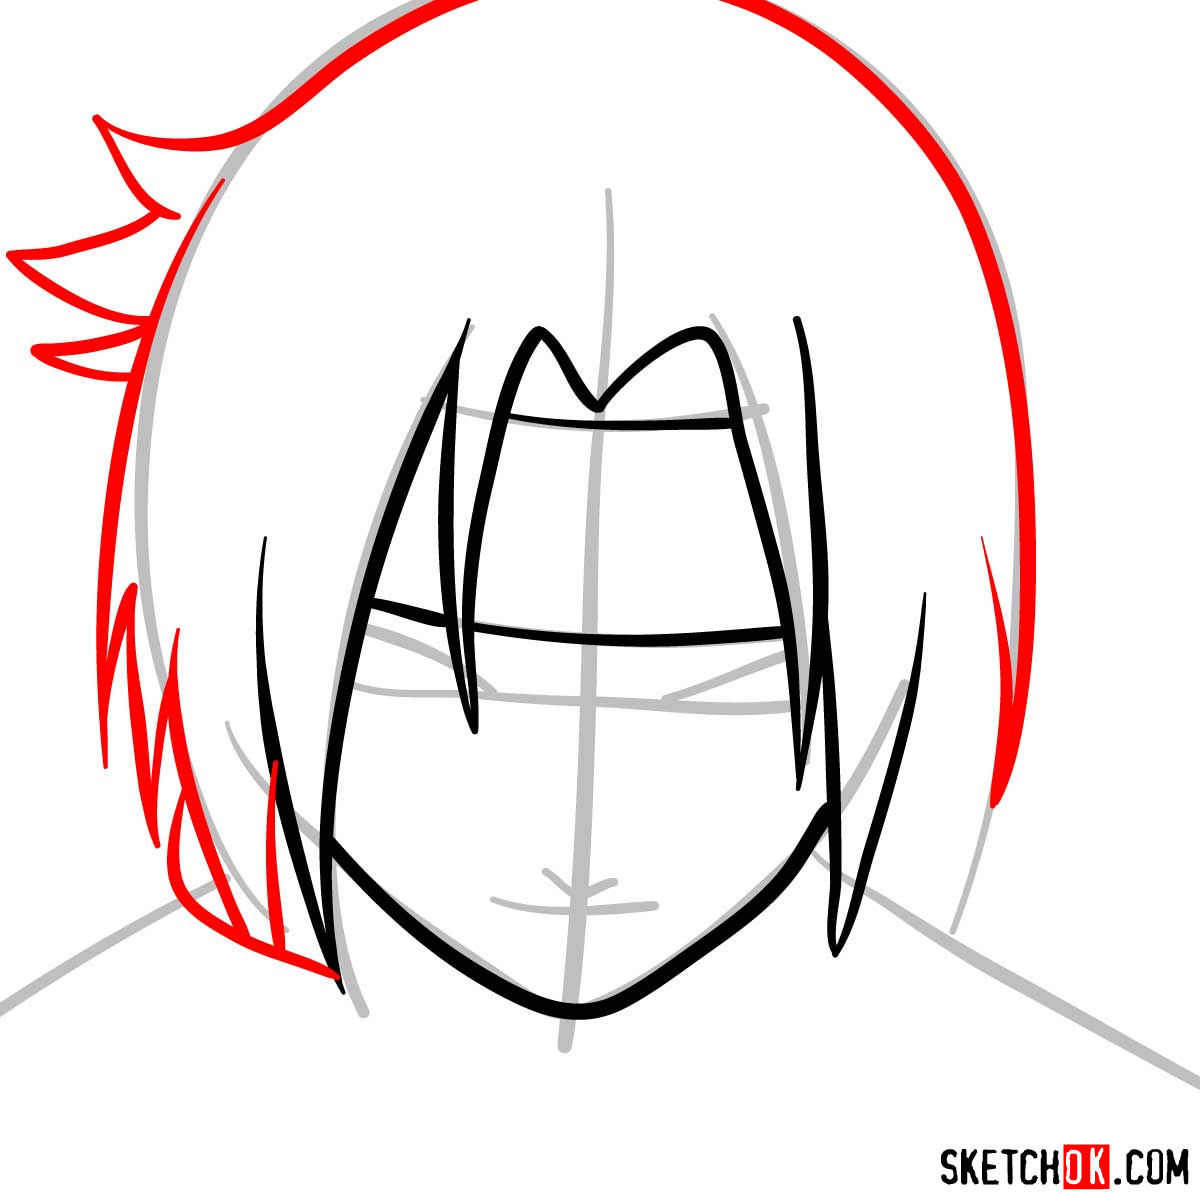 How to draw Sasuke's face (Naruto anime) - step 05